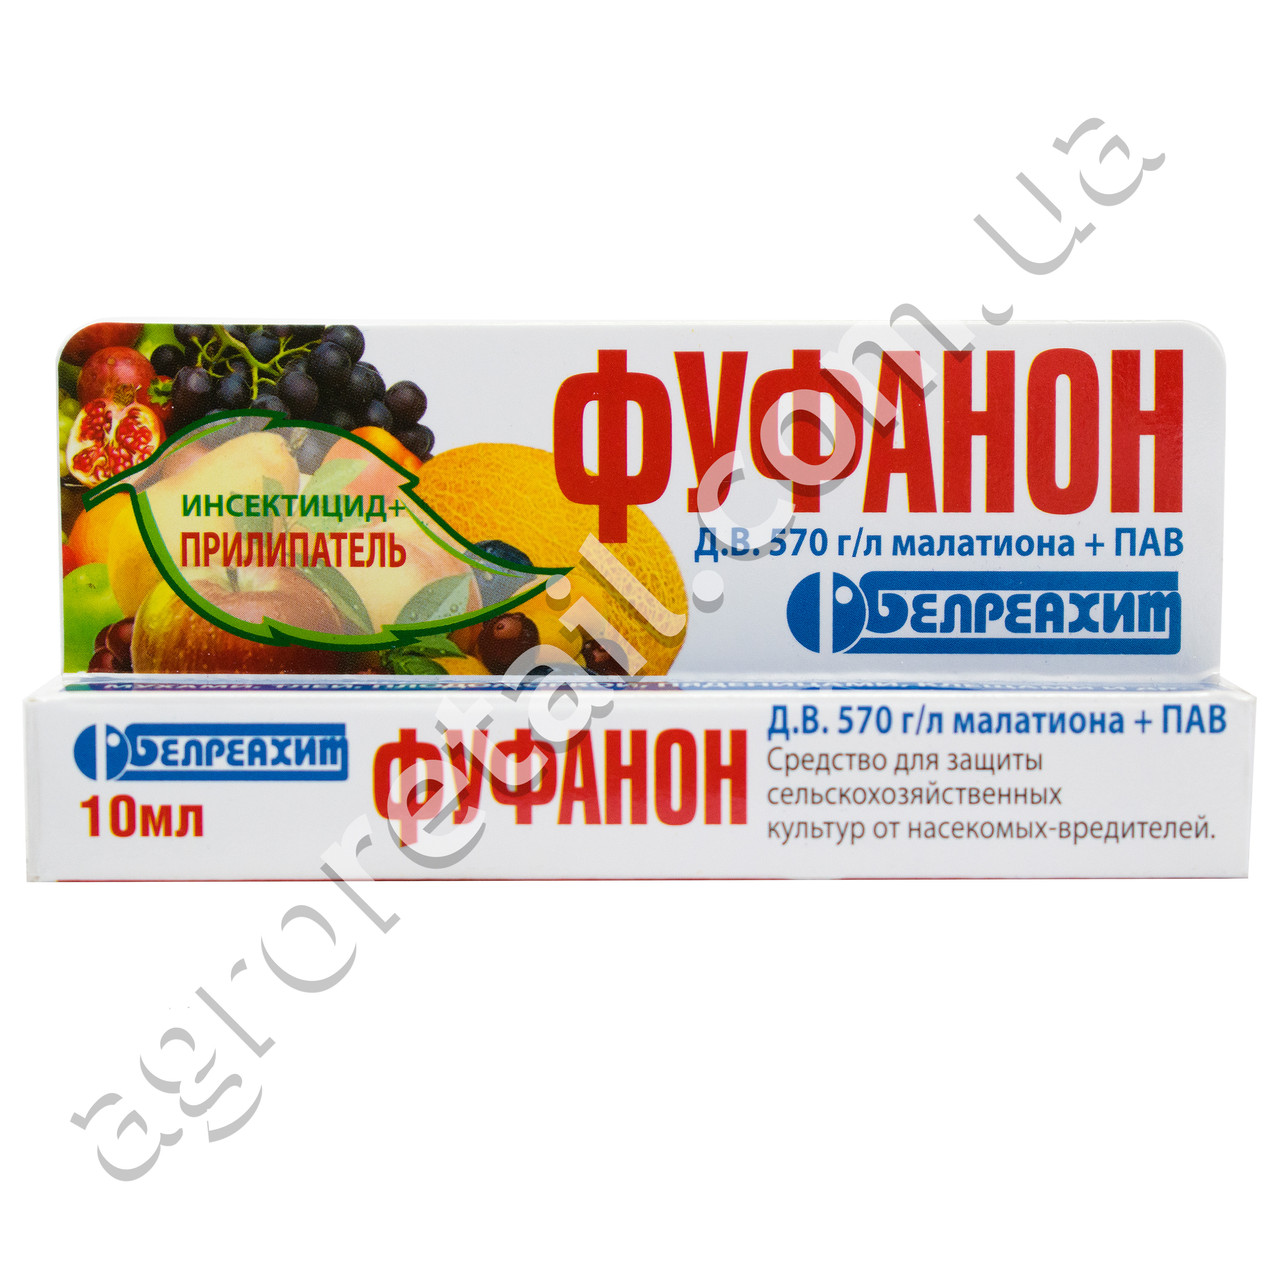 Инсектицид Фуфанон 10 мл картонная упаковка Белреахим